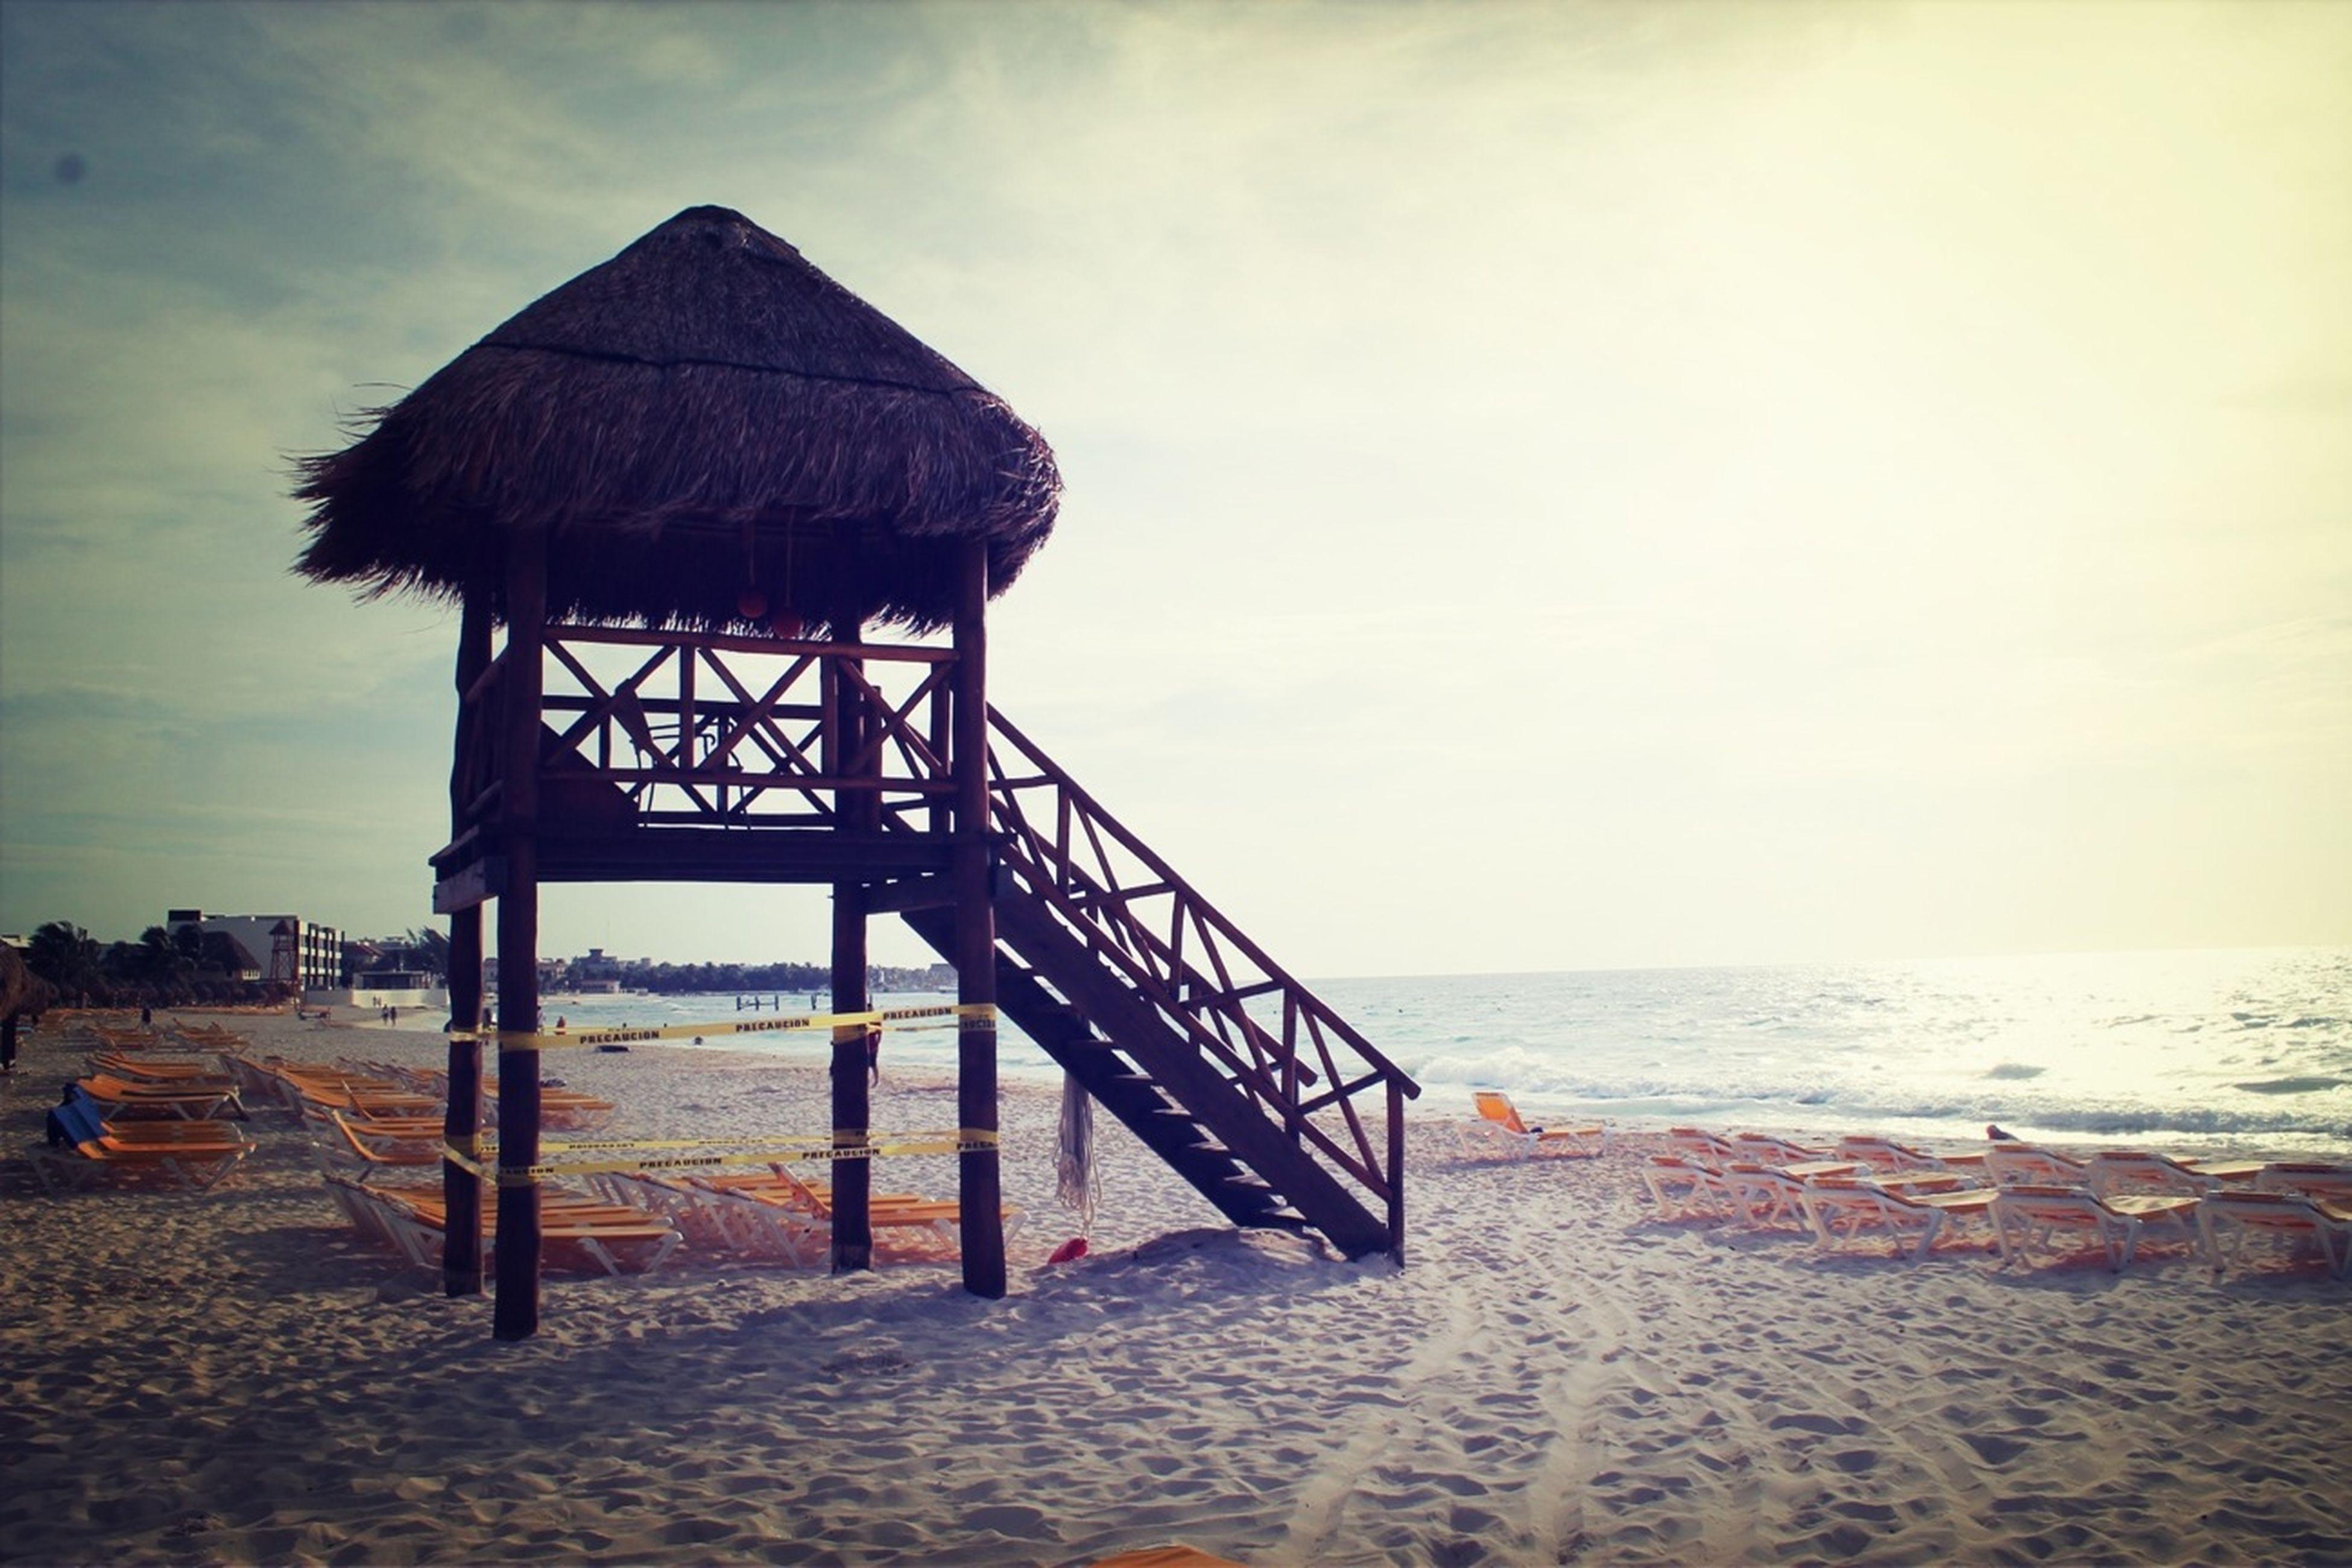 beach, sea, horizon over water, sand, shore, water, tranquility, sky, tranquil scene, scenics, nature, beauty in nature, idyllic, vacations, remote, pier, non-urban scene, coastline, ocean, outdoors